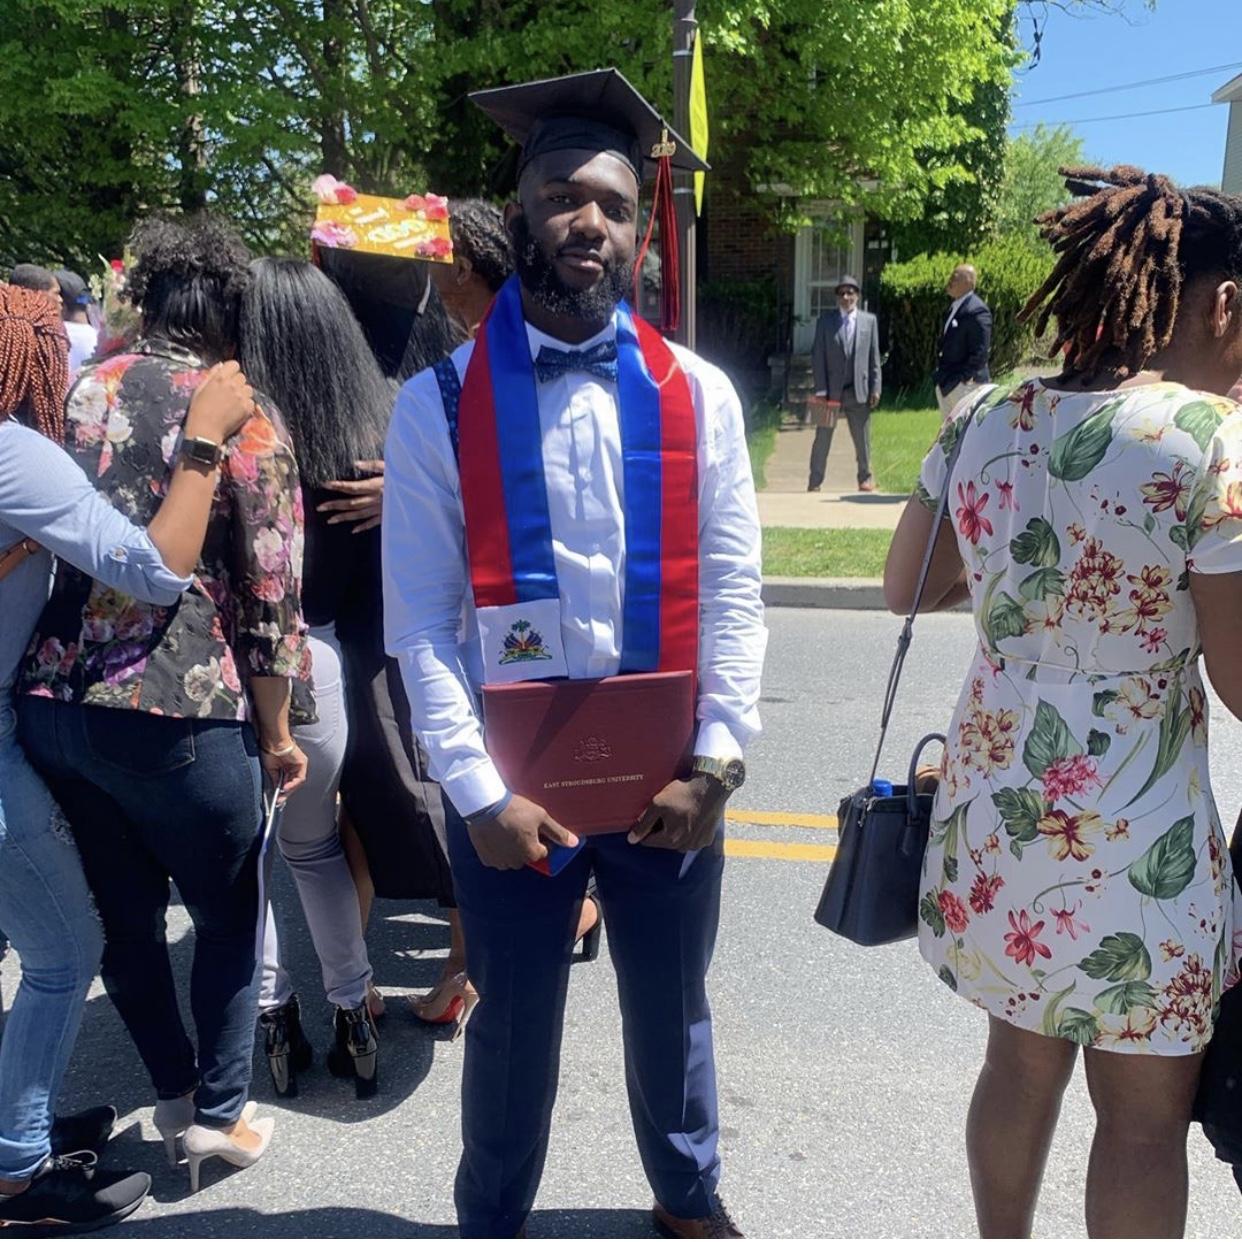 Salomon graduating from East Stroudsburg University